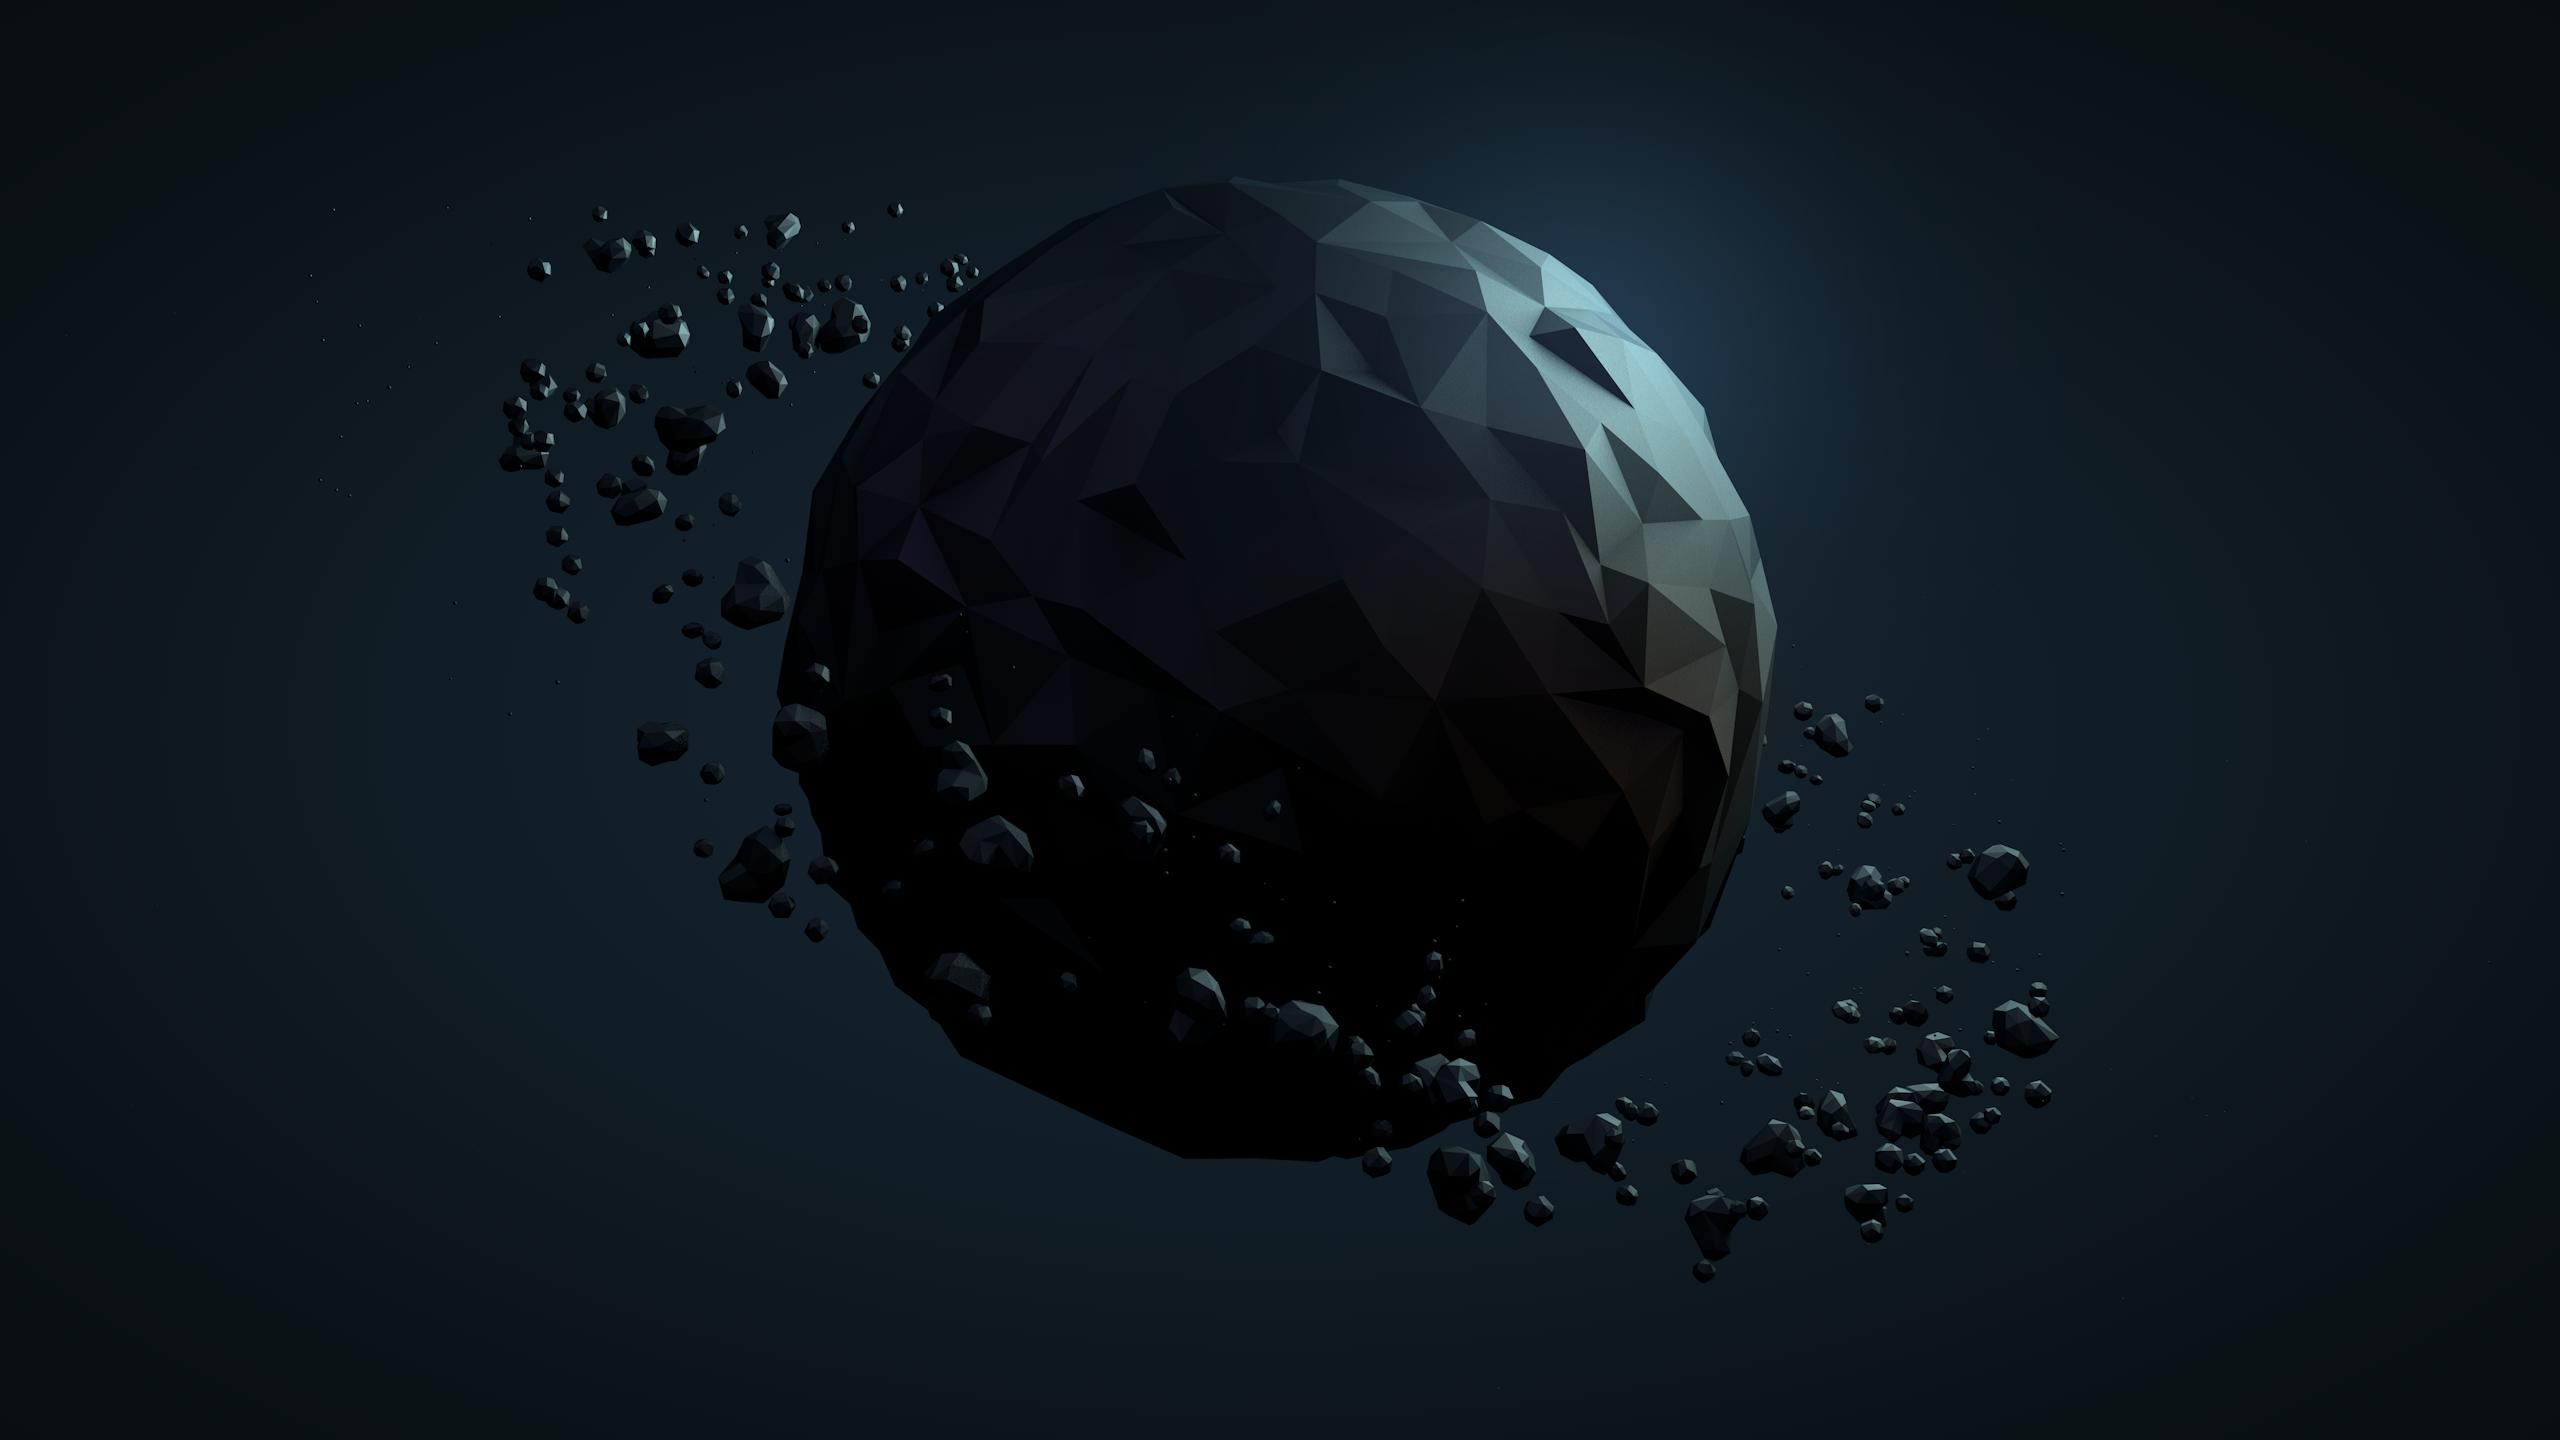 Fondos de pantalla Planeta poligonal Low poly